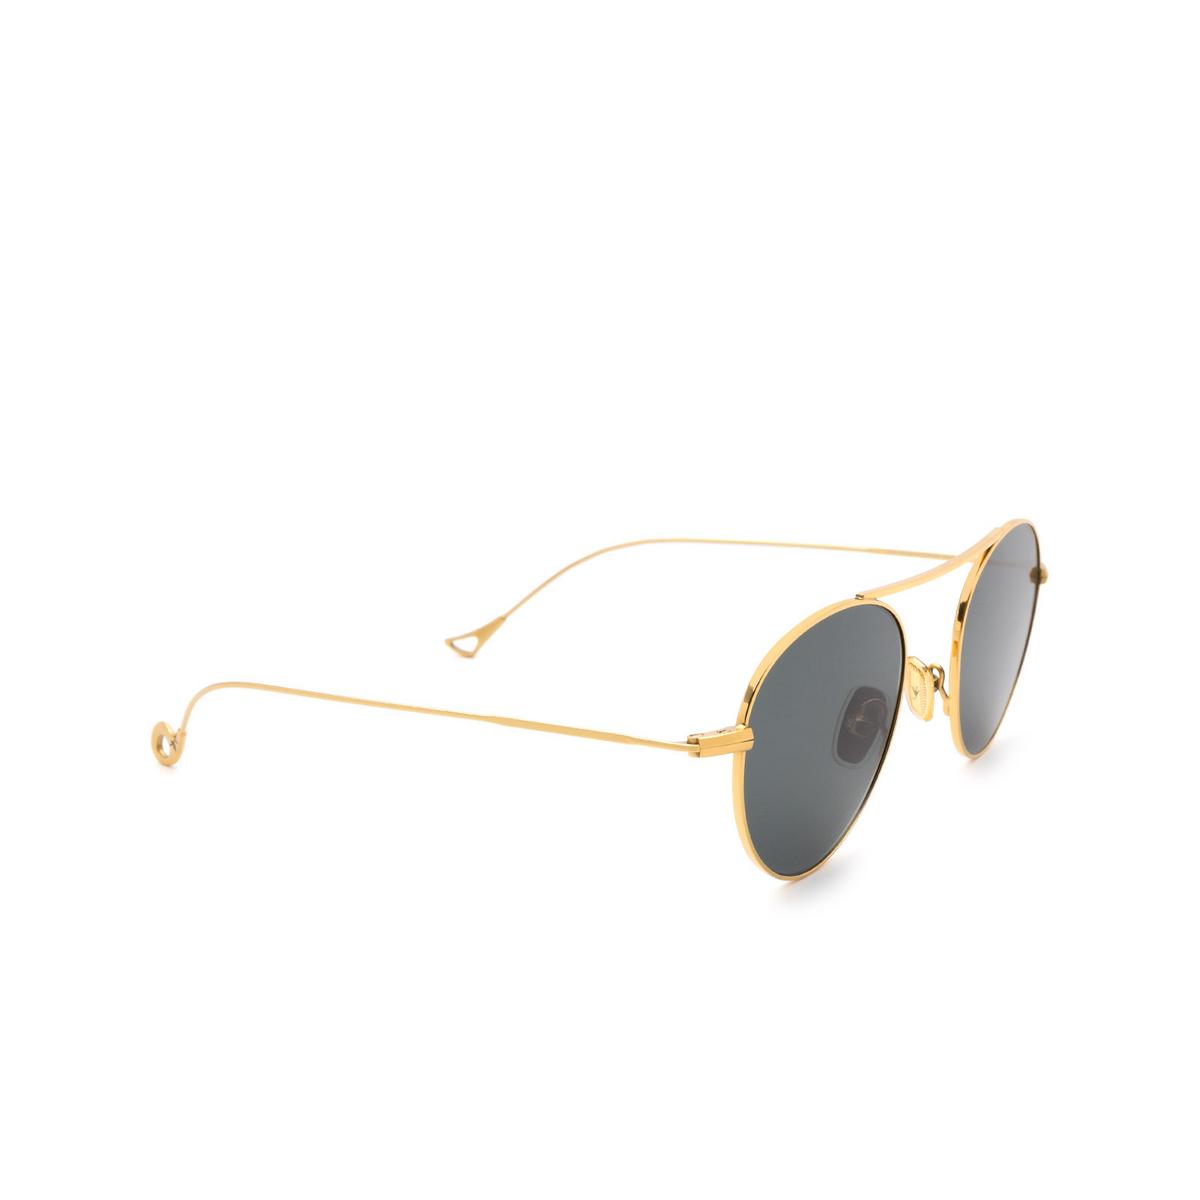 Eyepetizer® Round Sunglasses: En Bossa color Gold C.4-40 - three-quarters view.